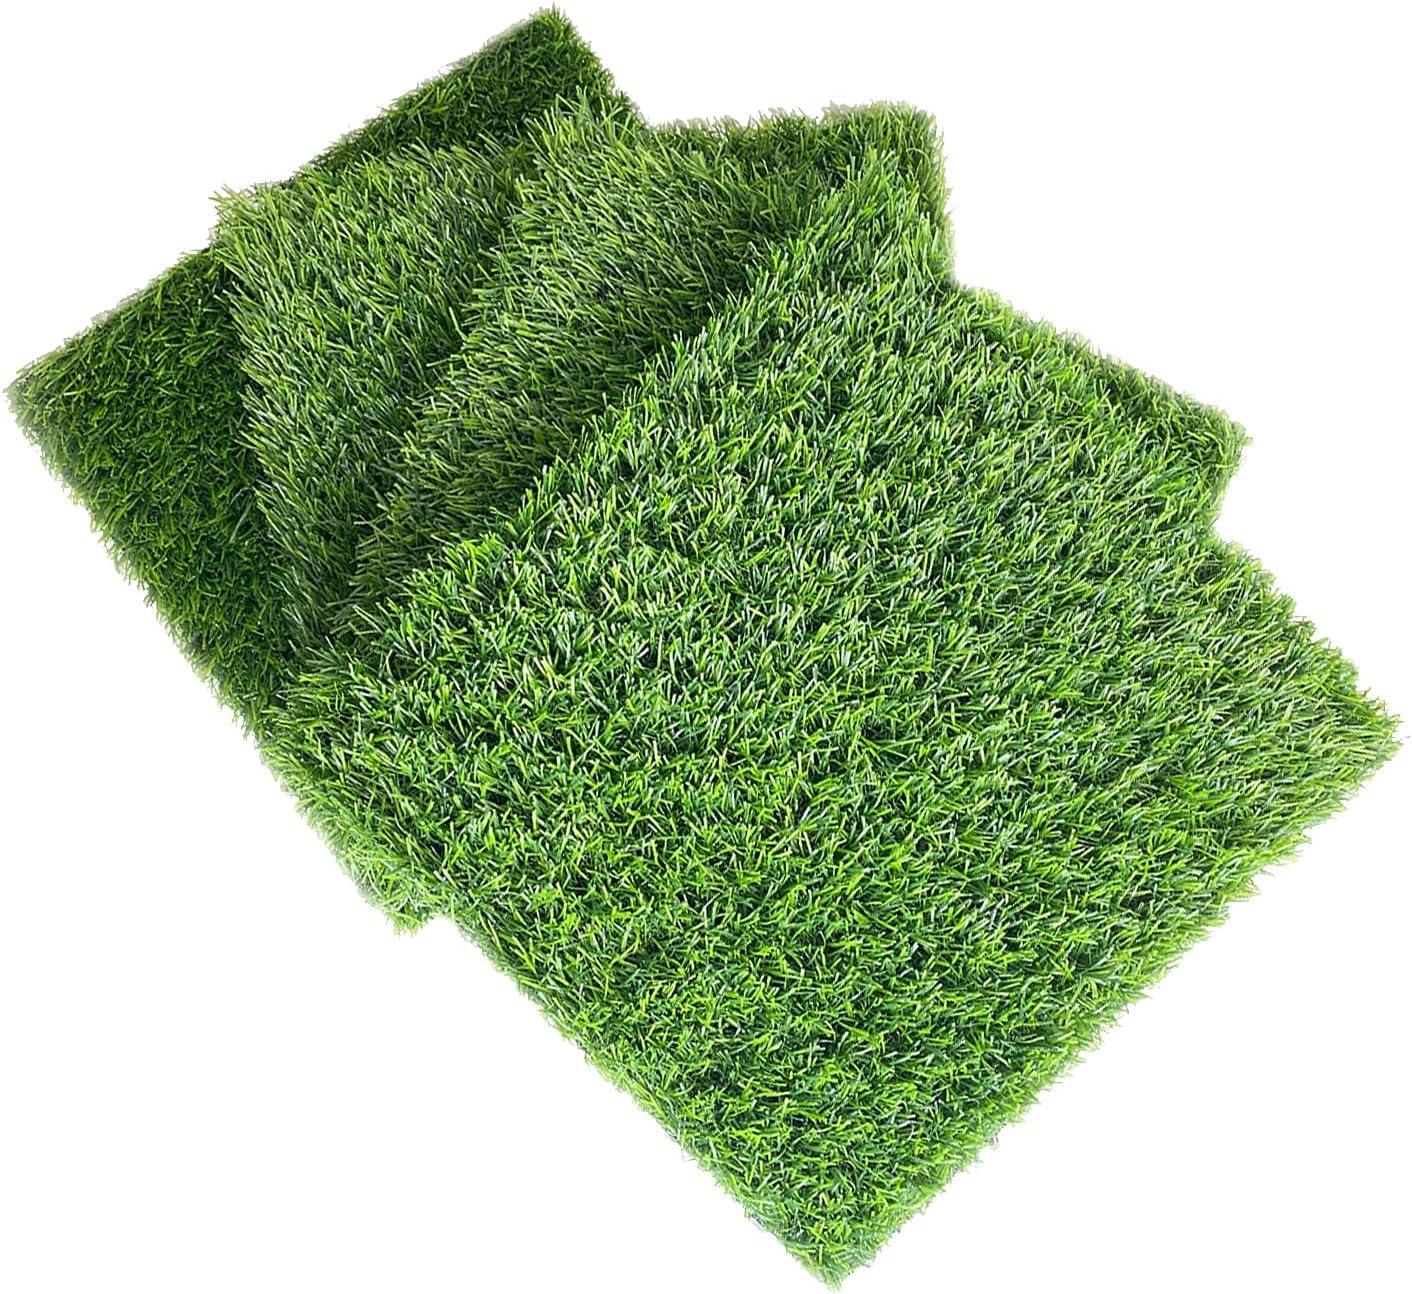 LVGADR Artificial Grass , Professional Outdoor Dog Changing Mat, Professional Outdoor Dog Grass Mat Realistic Artificial Turf Terrace Rug, Interlockable DIY Square Mat, for Courtyard, Garden.(4pack)